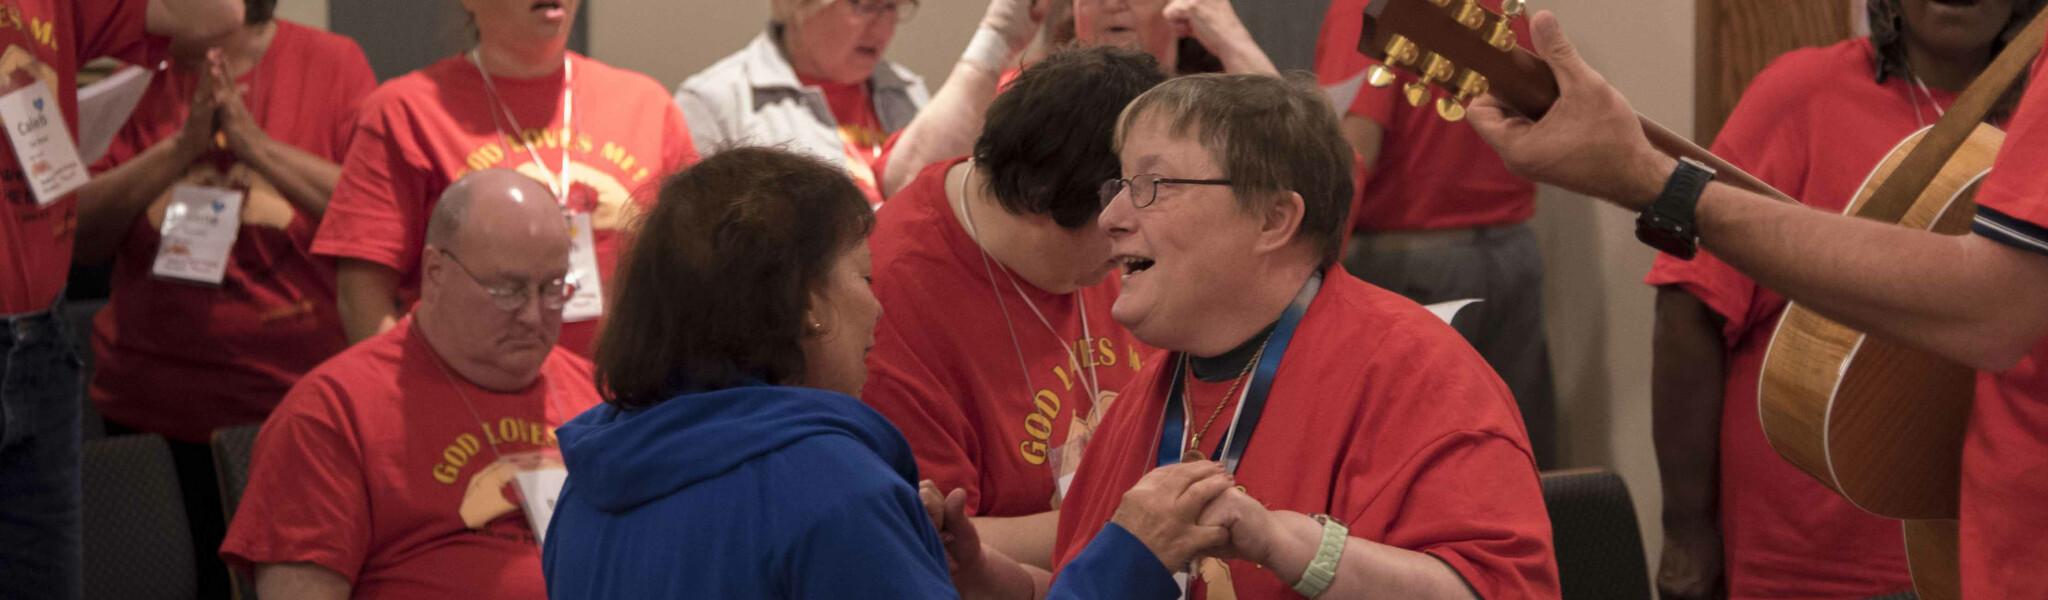 Disabilities Ministry   Cornerstone Lutheran Church   Cornerstone Lutheran Church